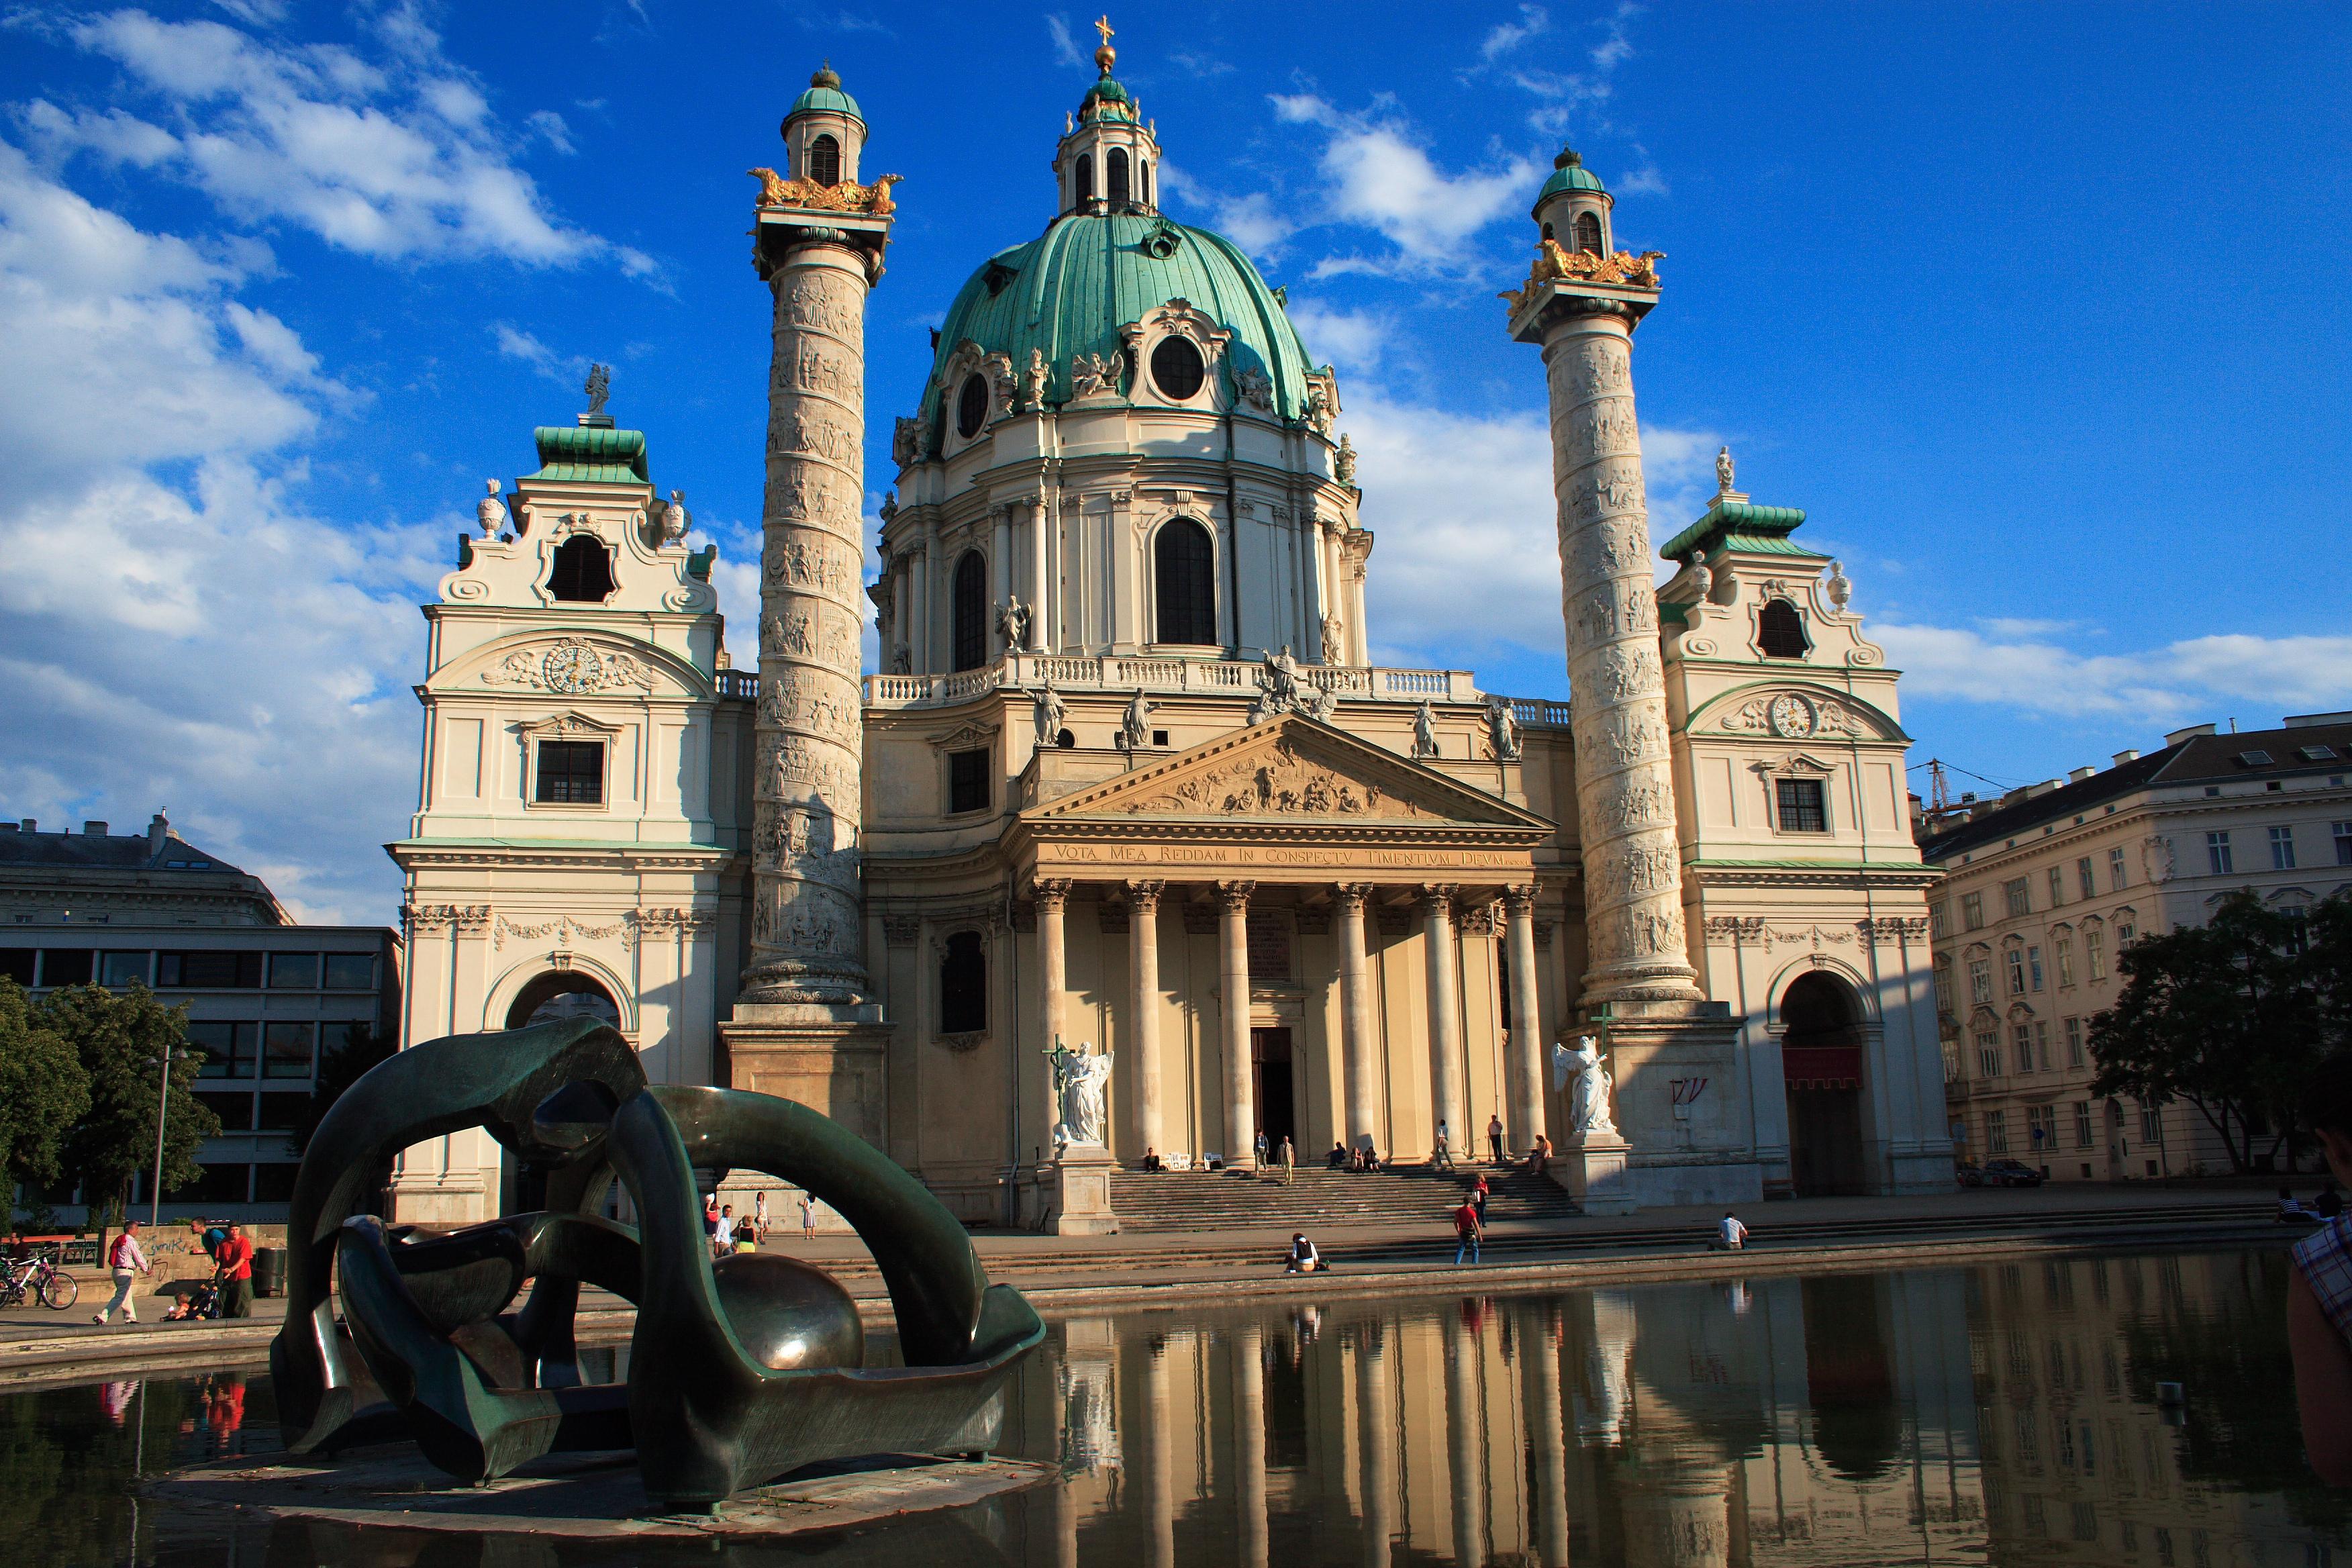 https://i1.wp.com/upload.wikimedia.org/wikipedia/commons/7/7b/Karlskirche,_Vienna.jpg